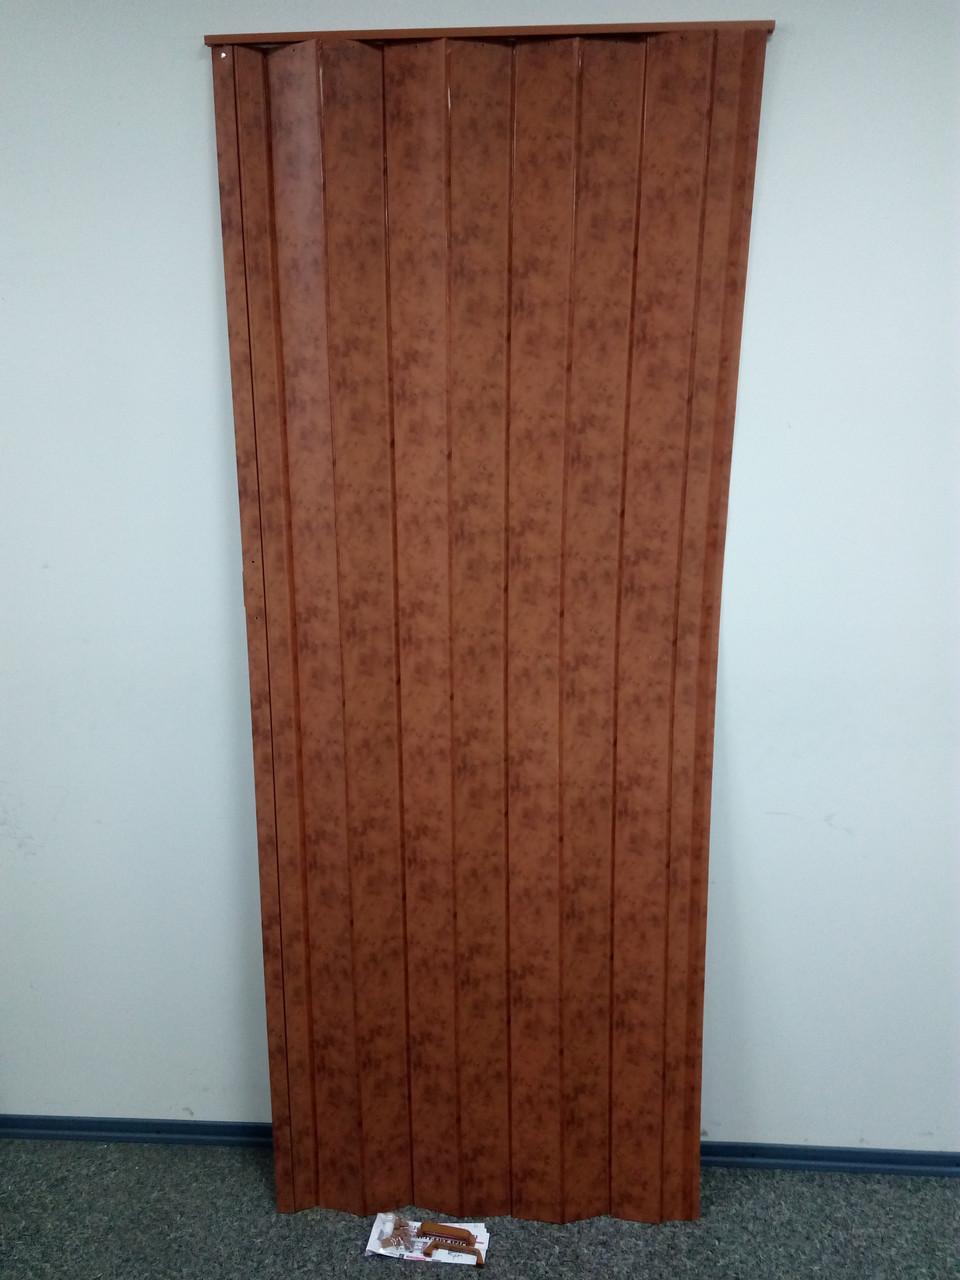 Дверь ширма гармошка, 4785 мрамор темный, 820х2030х0,6 мм, раздвижные межкомнатные пластиковые глухие